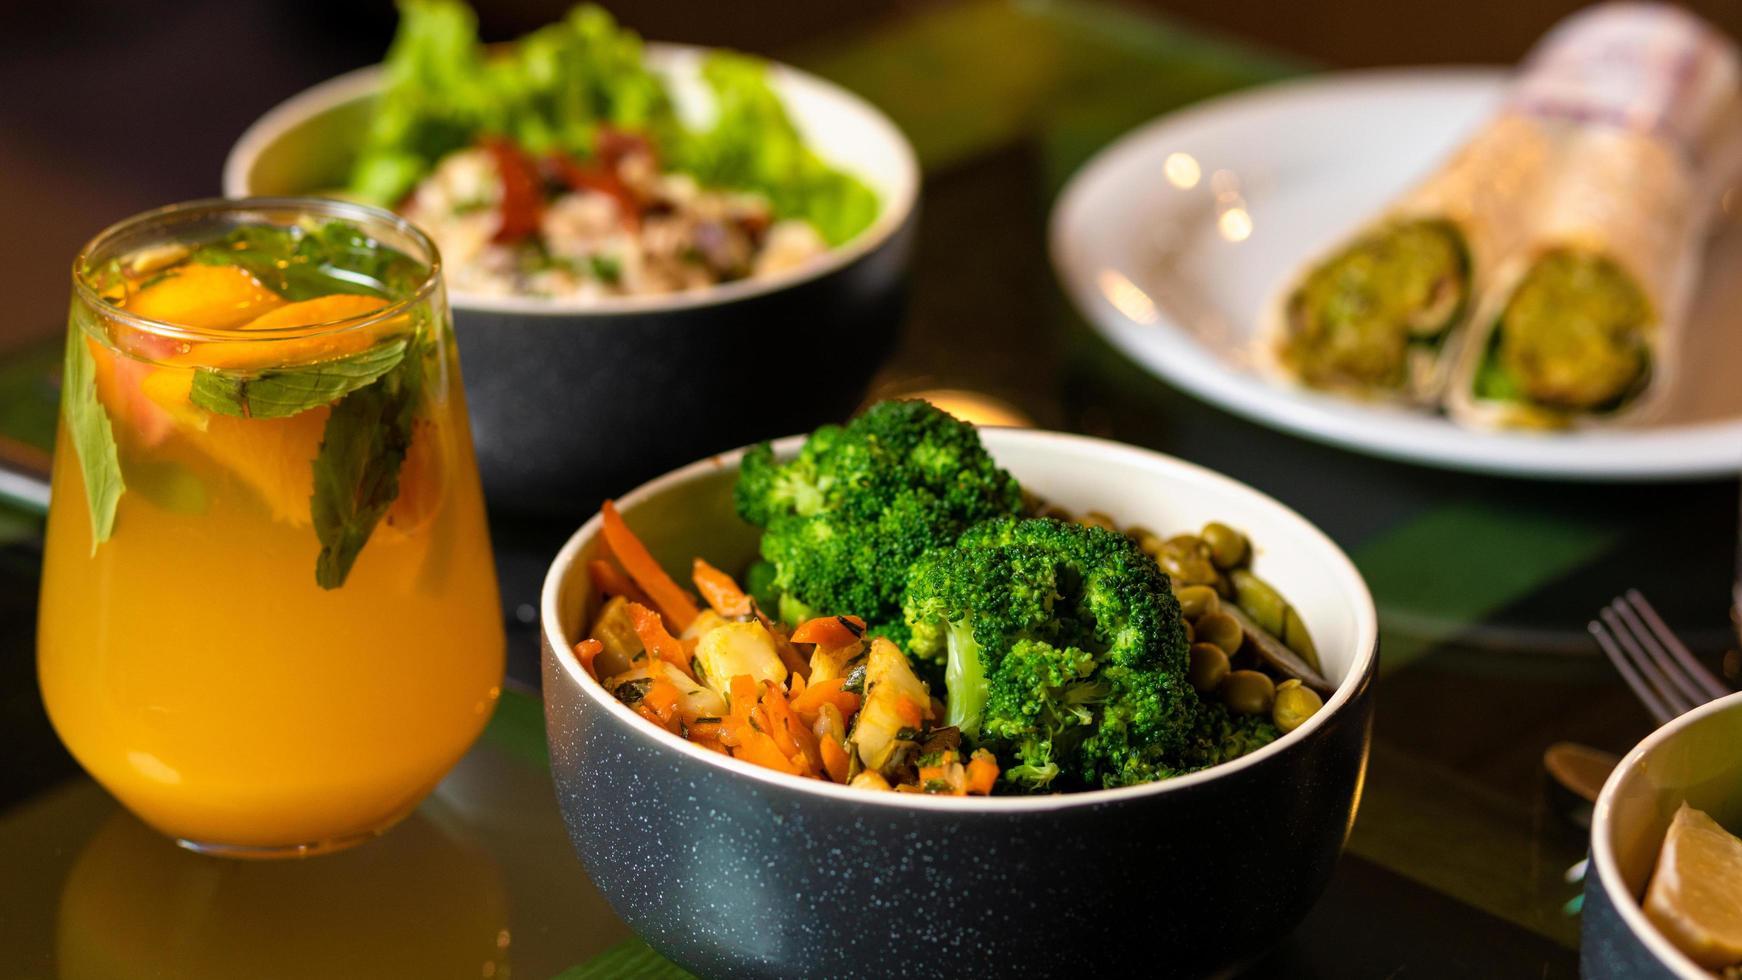 insalata vegetariana con succo d'arancia foto